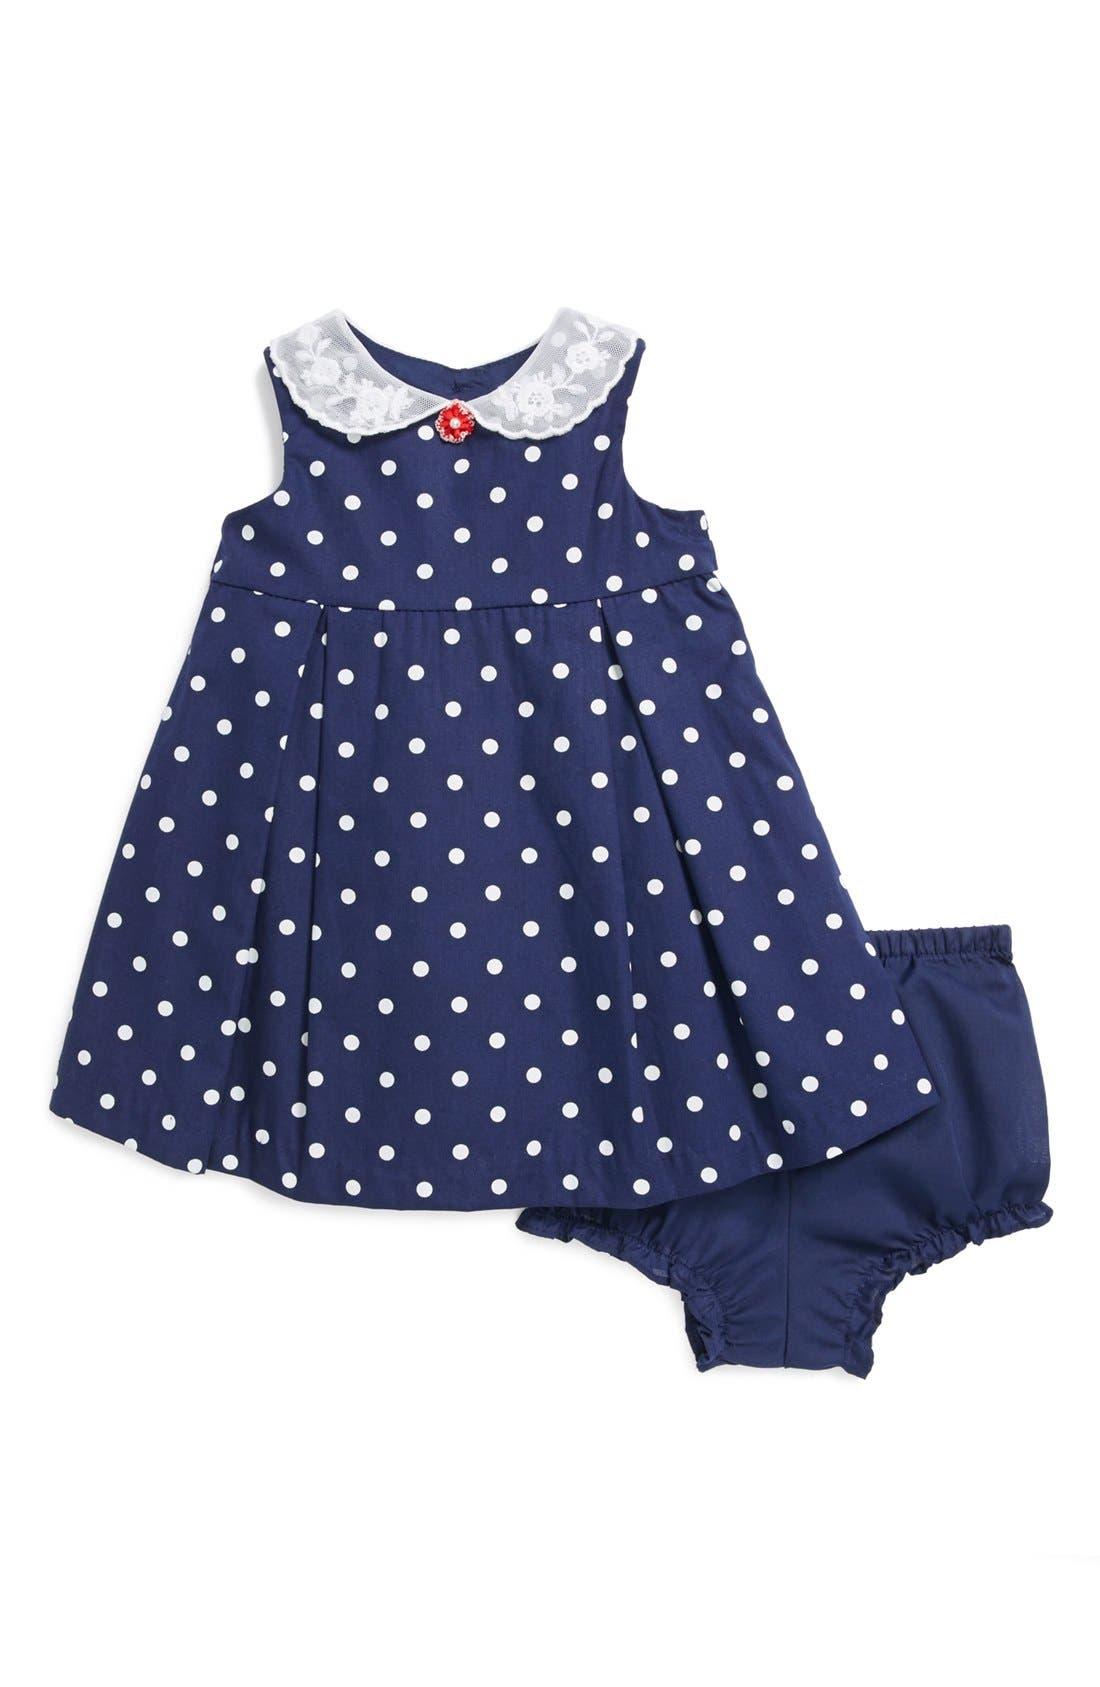 Main Image - Pippa & Julie Polka Dot Dress & Bloomers (Baby Girls)